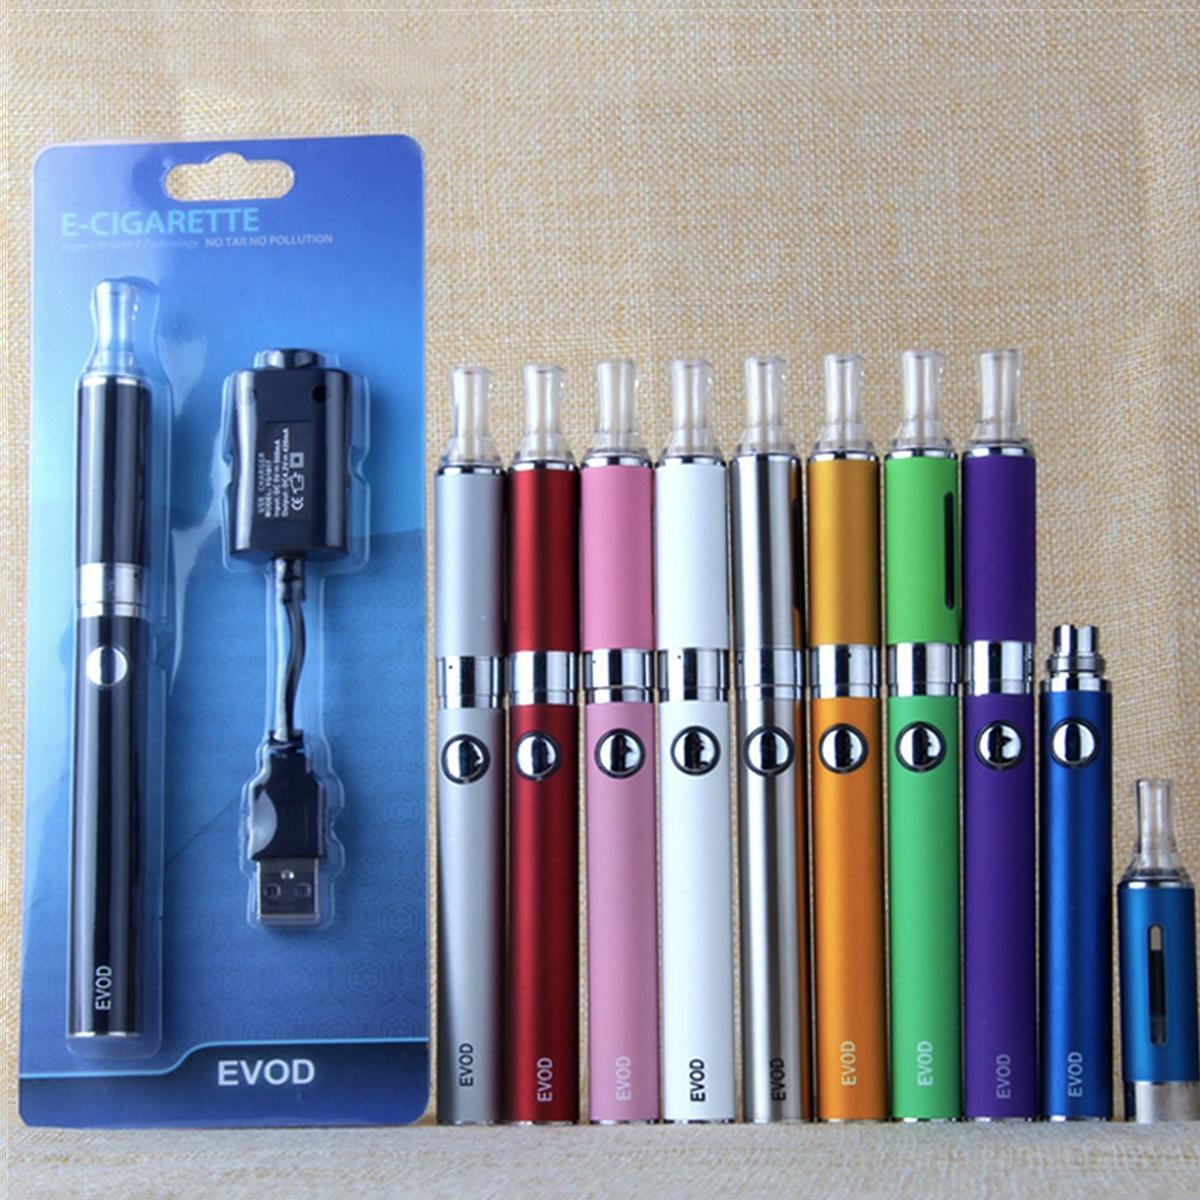 EGO EVOD MT3 Blister Pack Starter Kit с 650 мАч 900 мАч 1100 мАч предварительно нагревая батарея UGO Pavorizer распылитель бак для вап